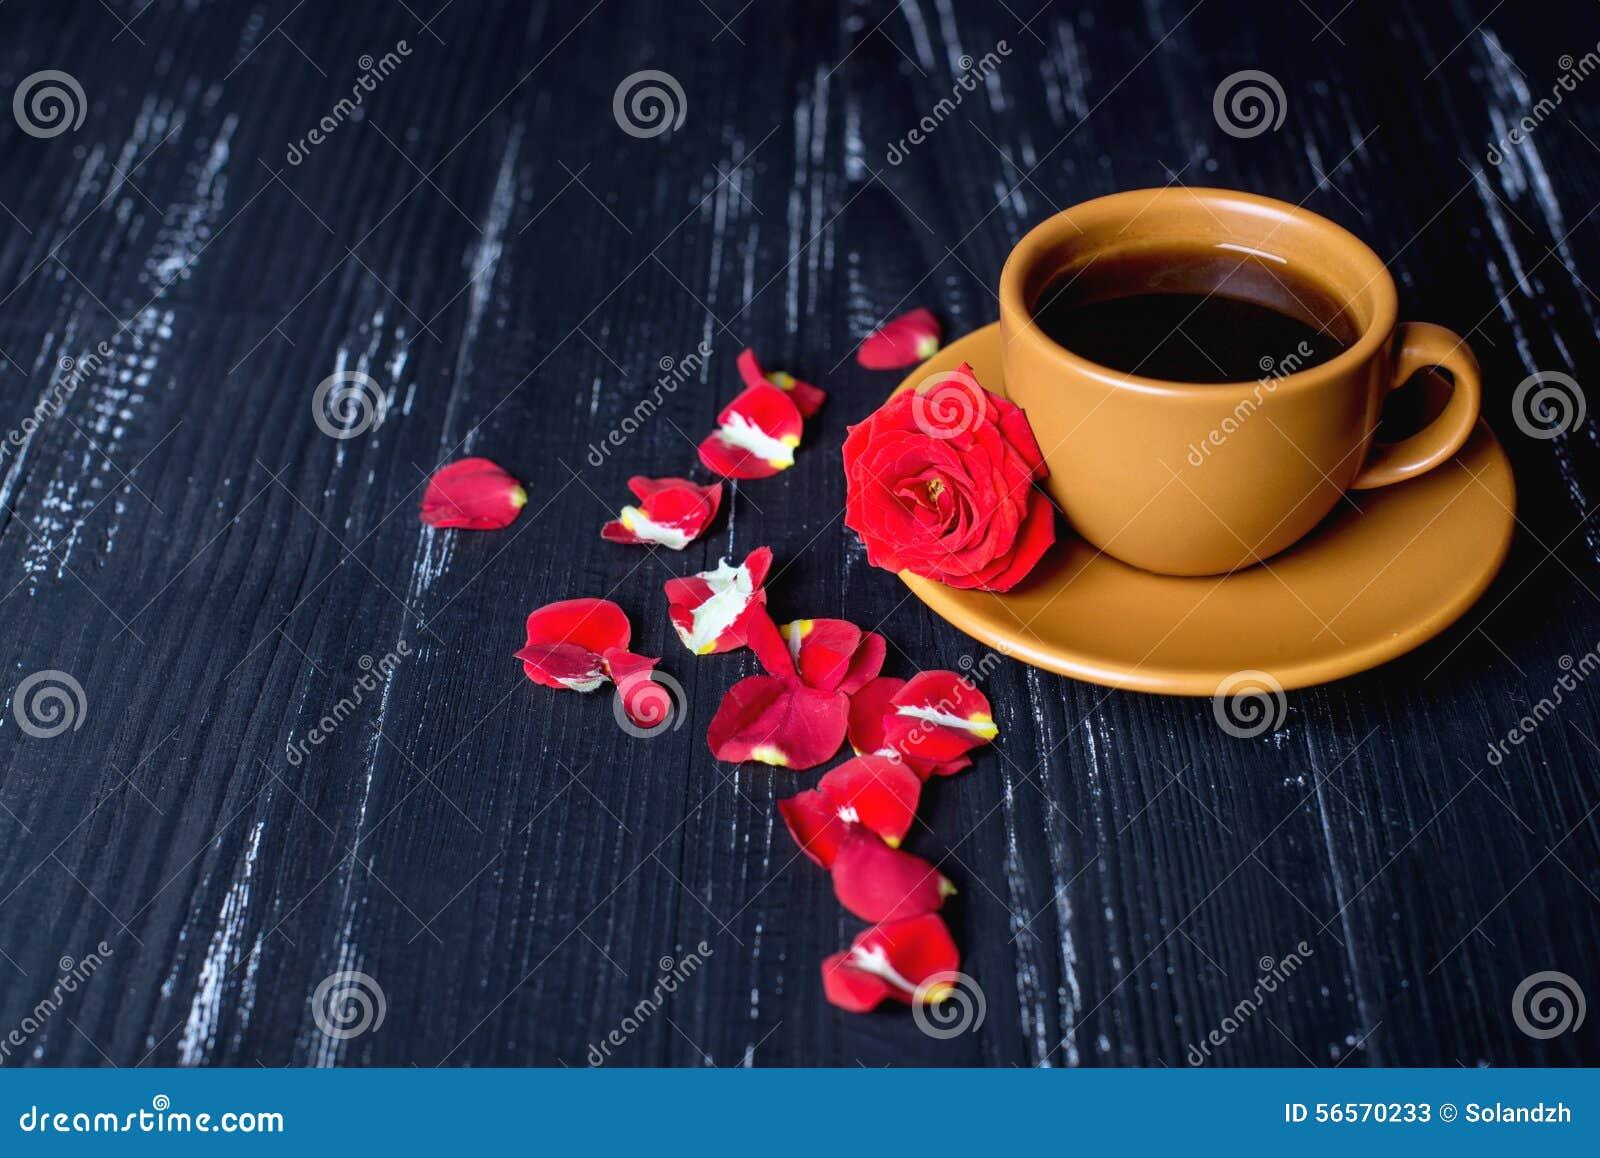 Download Πορτοκαλί φλυτζάνι καφέ με τα ροδαλά πέταλα στο μαύρο υπόβαθρο Στοκ Εικόνα - εικόνα από διακοπές, έννοια: 56570233